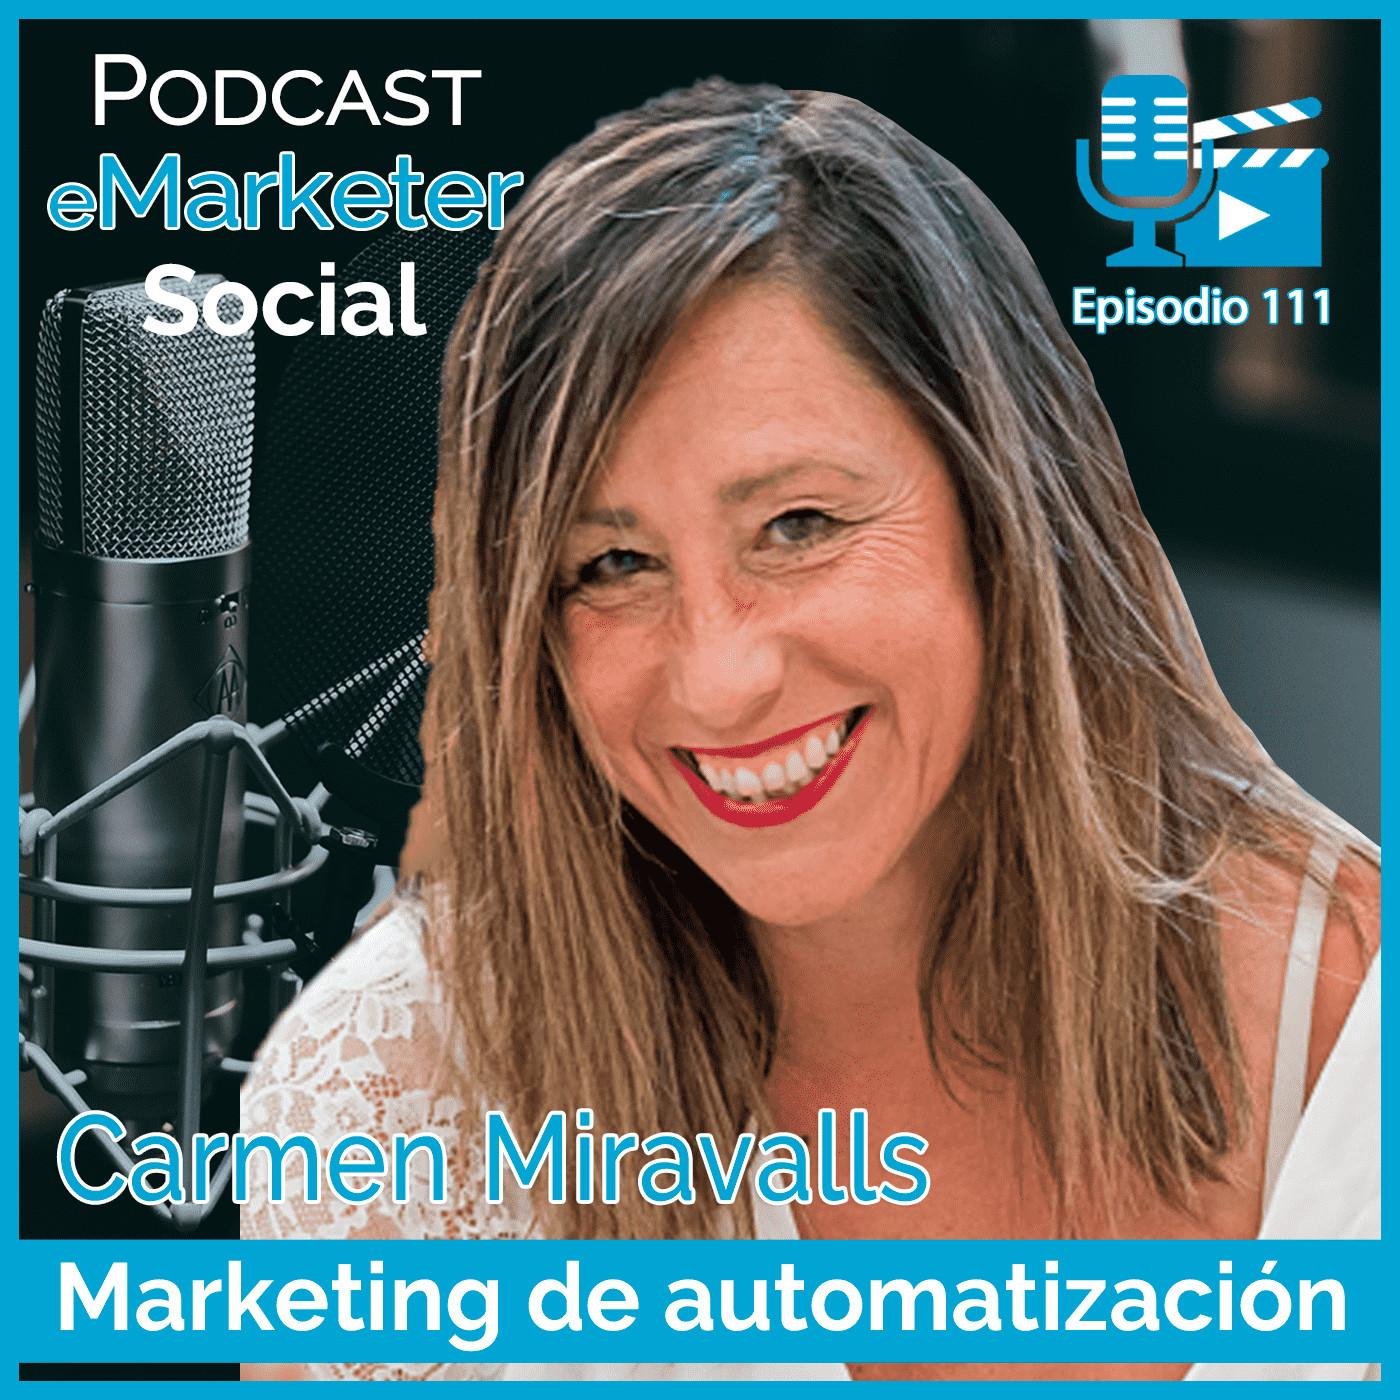 111 Carmen Miravalls fundadora de Marketonarium en Podcast eMarketerSocial